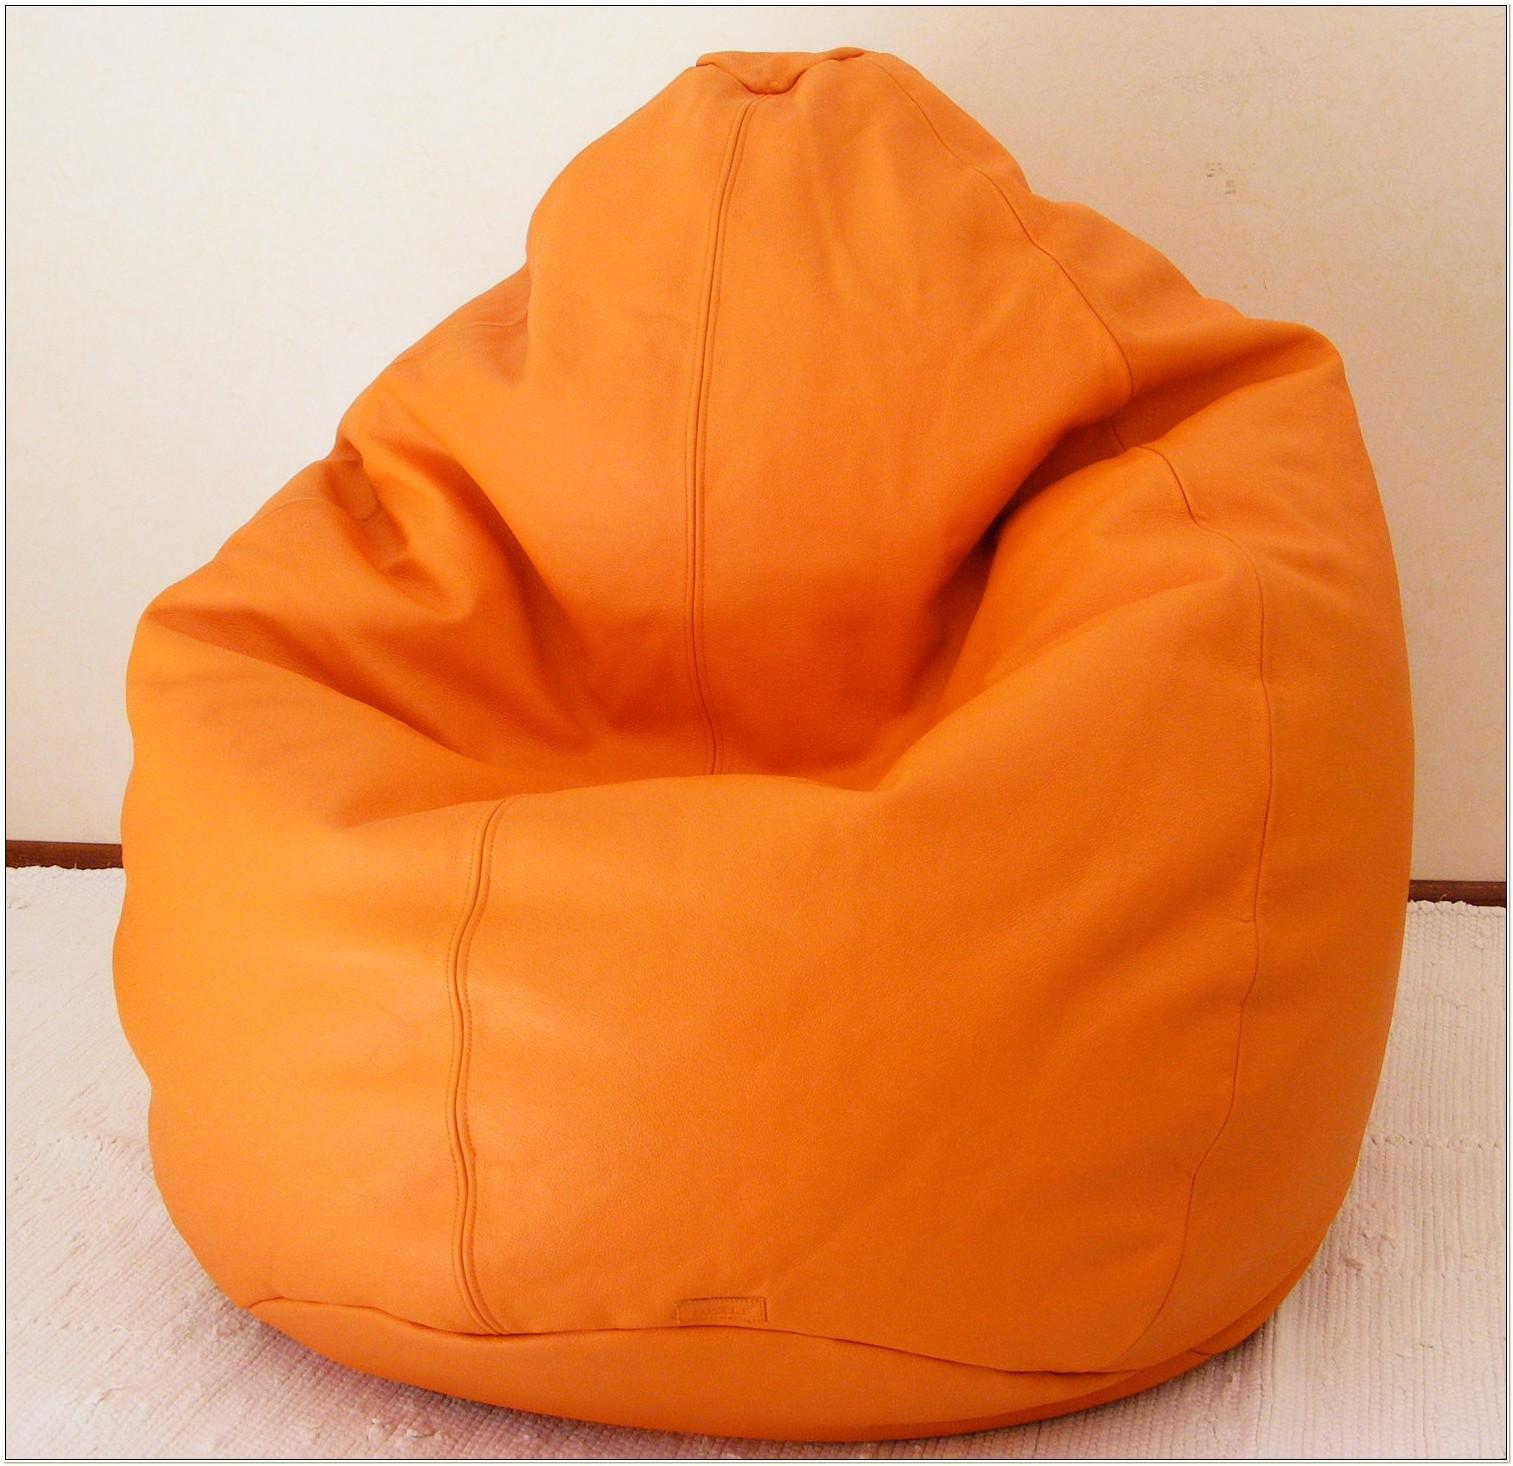 Teardrop Bean Bag Chair Pattern